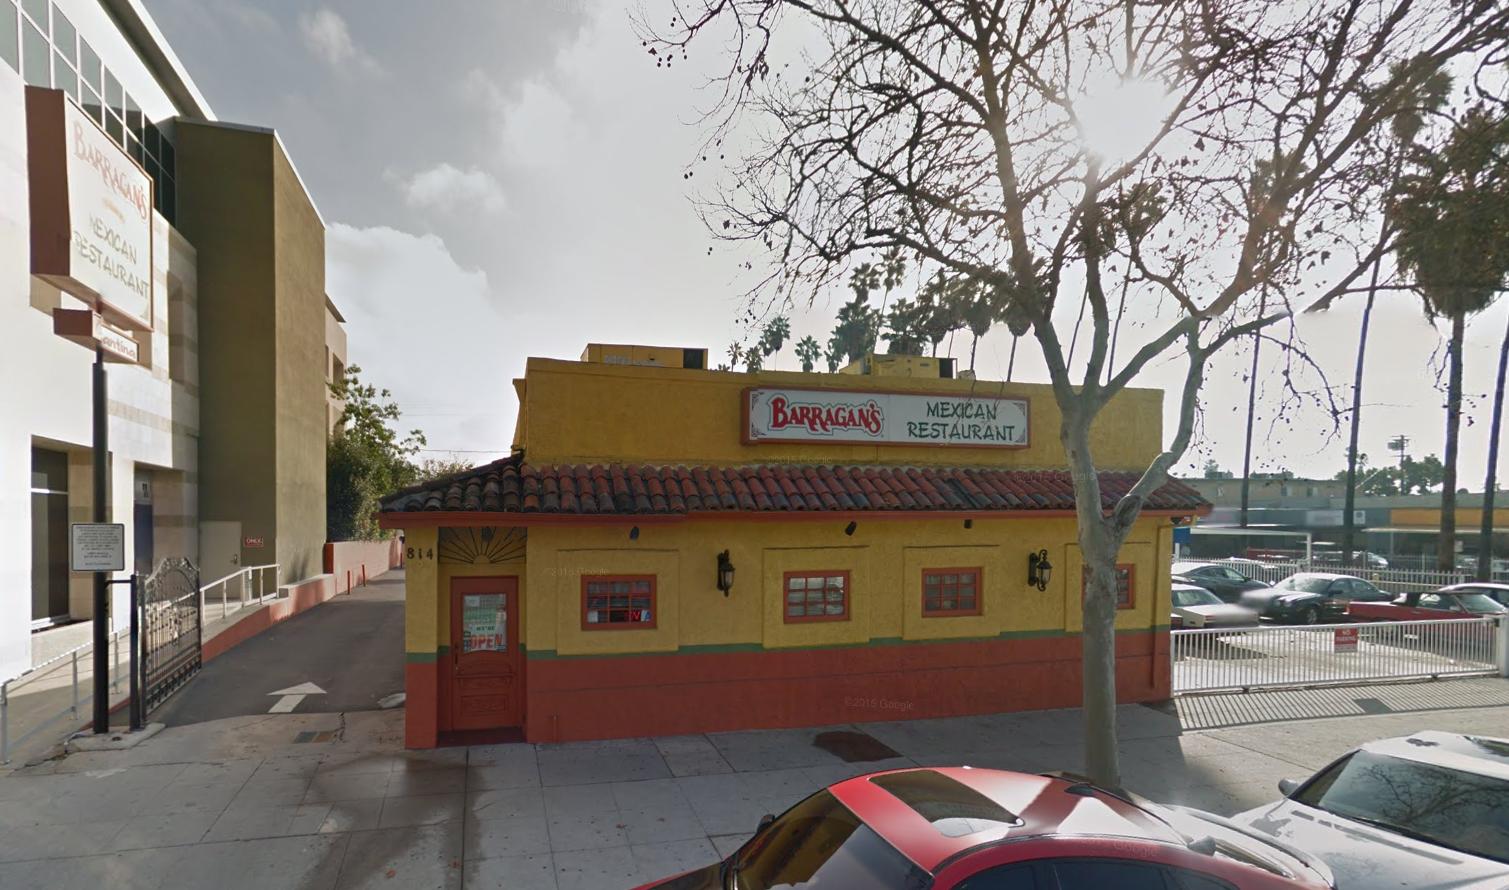 Barragan S Mexican Restaurant In Glendale Menu